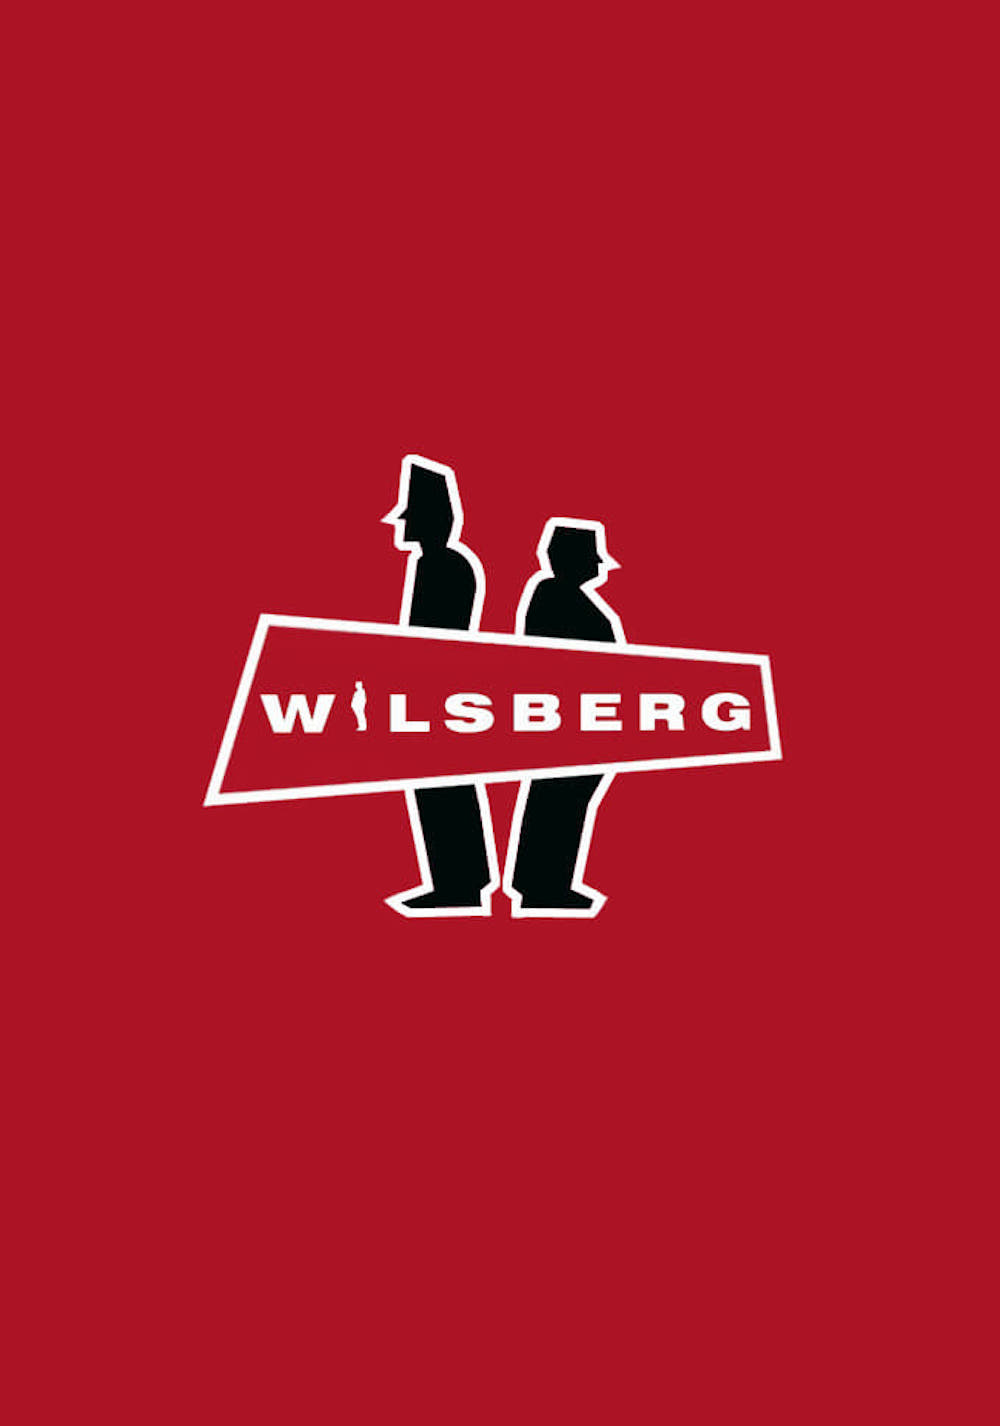 Wilsberg Tv